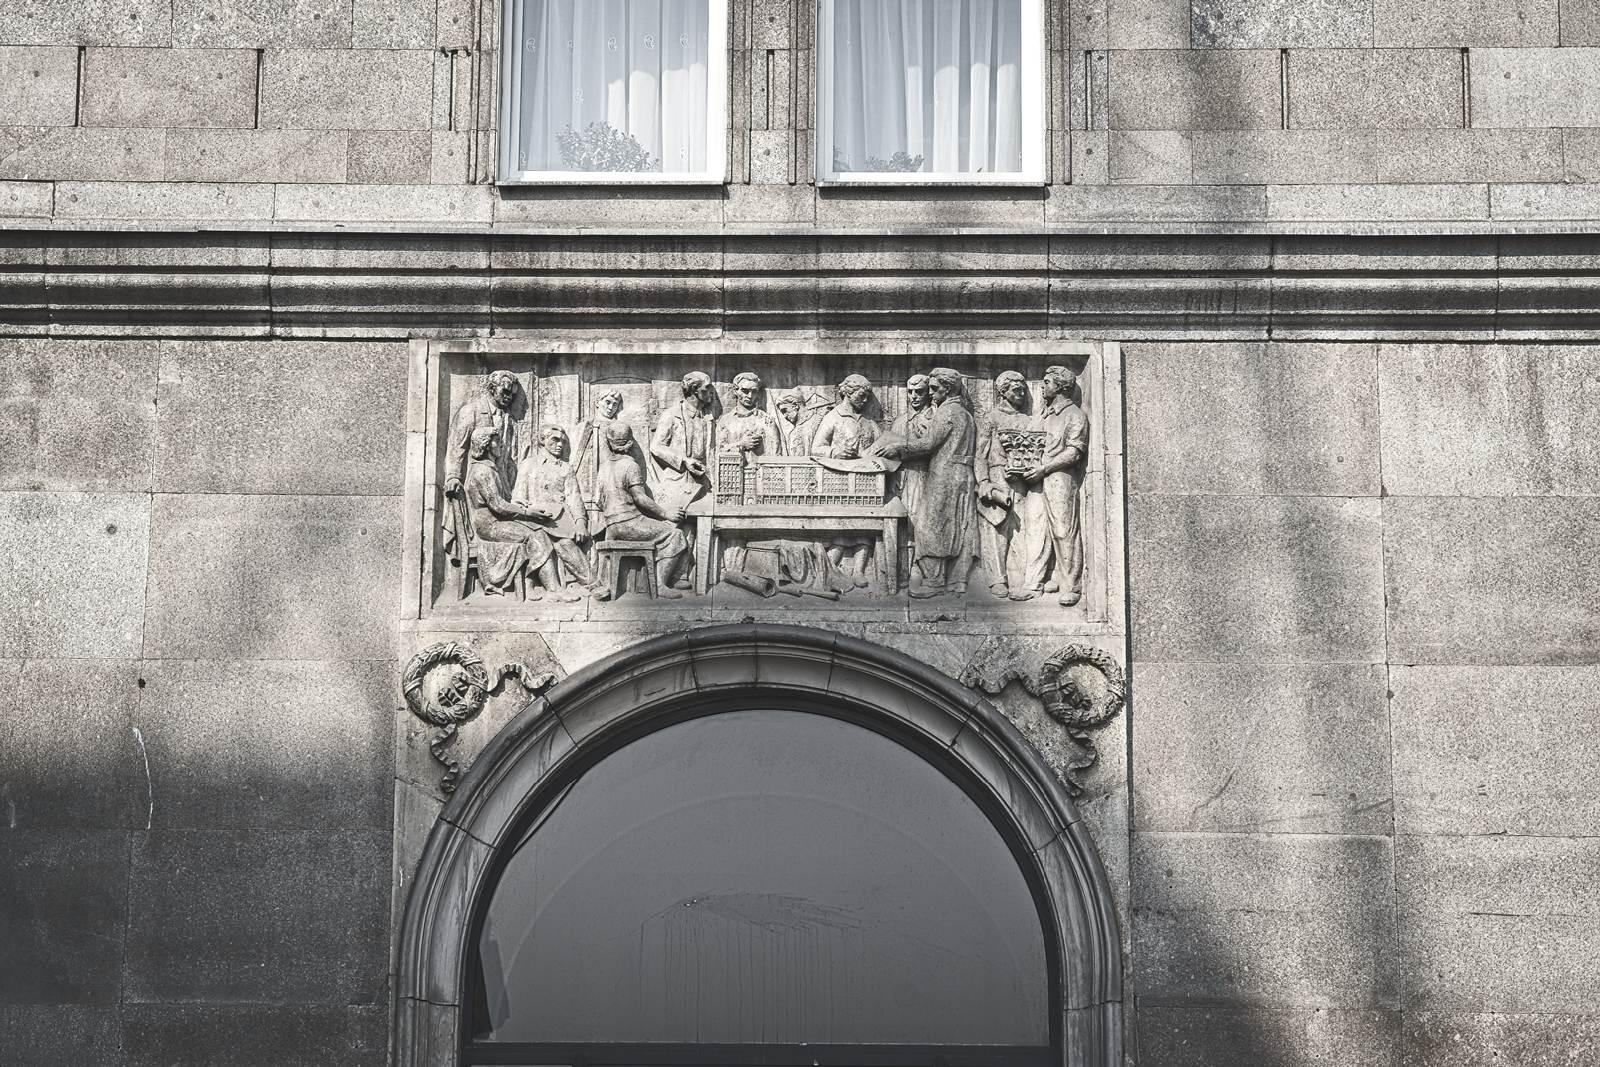 socrealism in warsaw plac konstytucji